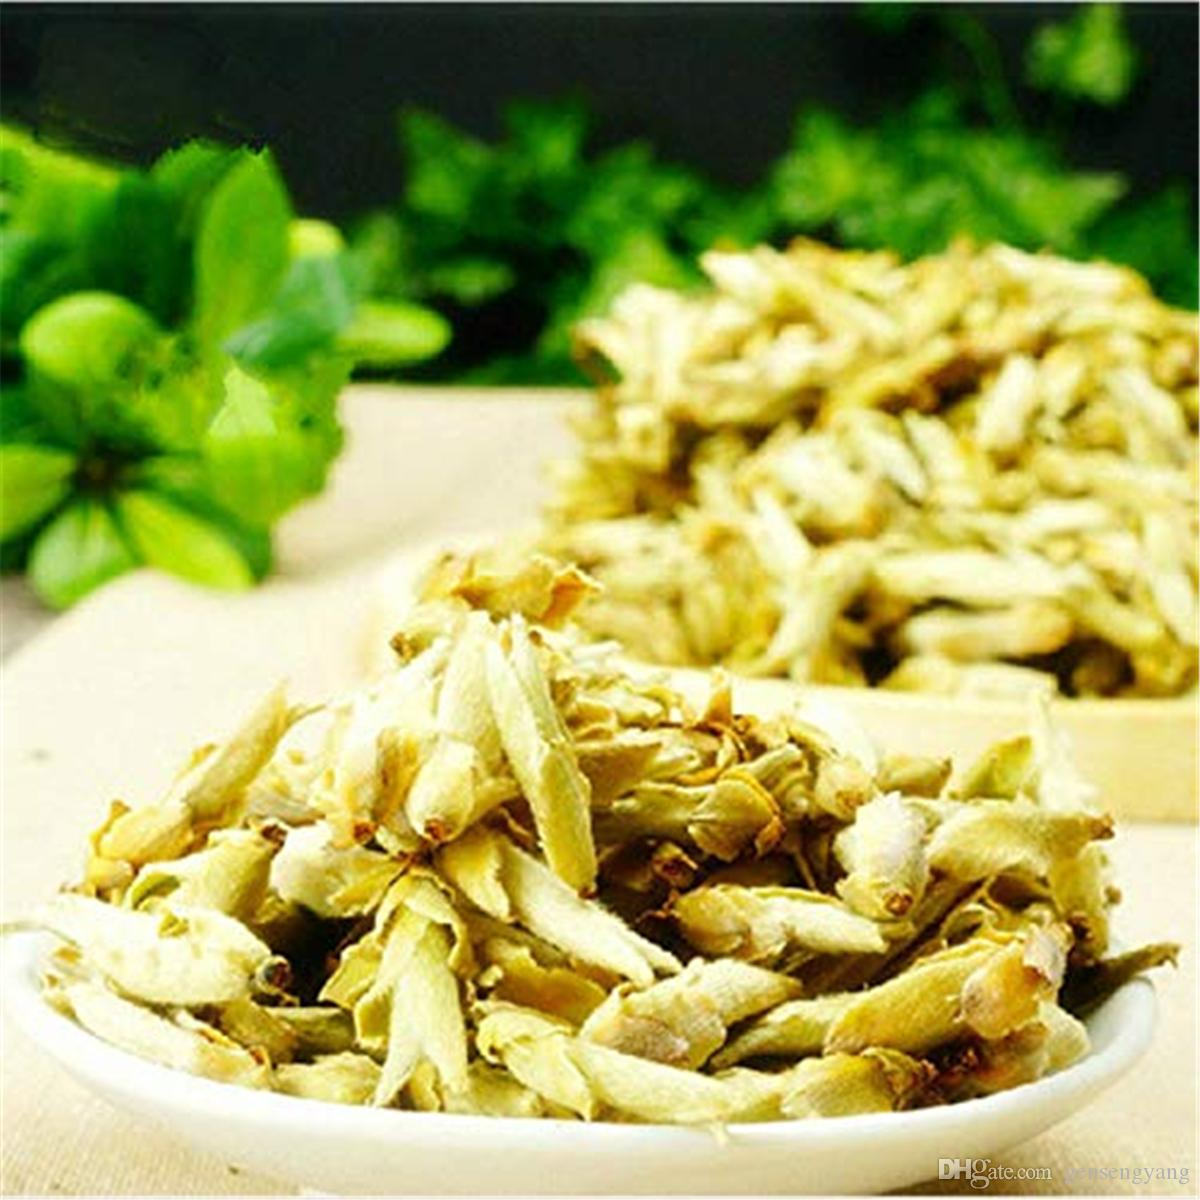 100 g cru Puer thé Yunnan loose blanc Puer thé biologique Pu'er Old Green Tree Puer Natural Puerh Tea Factory Direct Sales